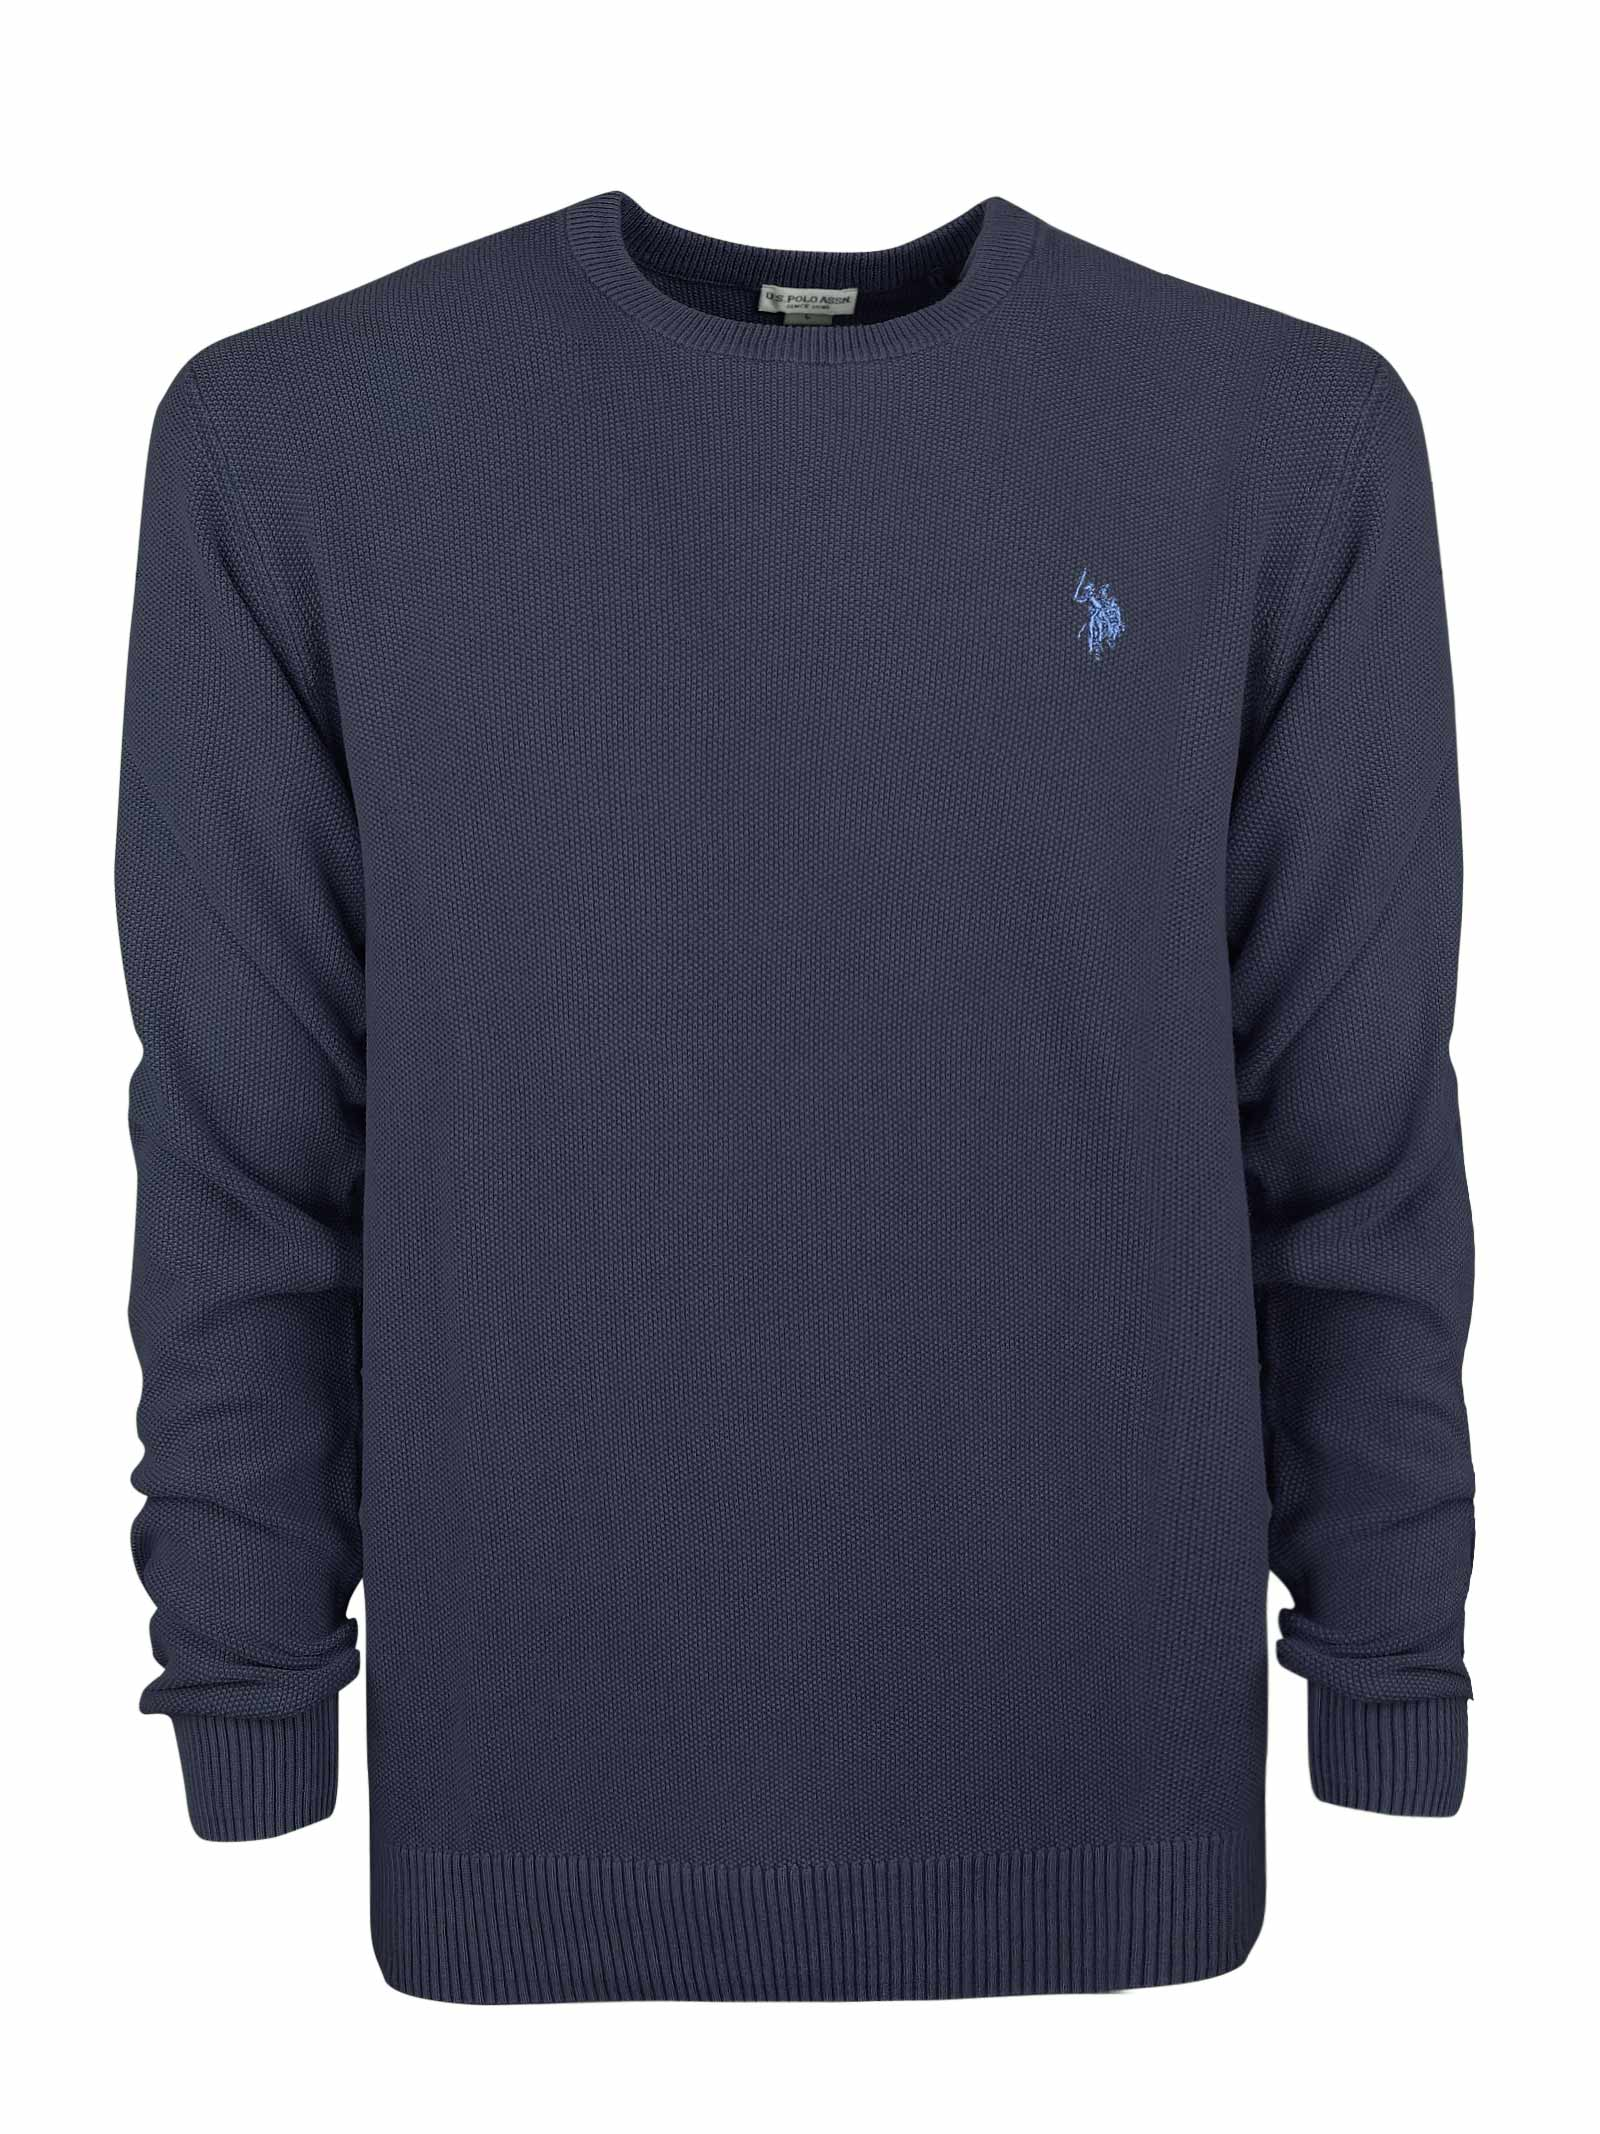 US POLO ASSN. | Knitwear | 173 59923 52678479